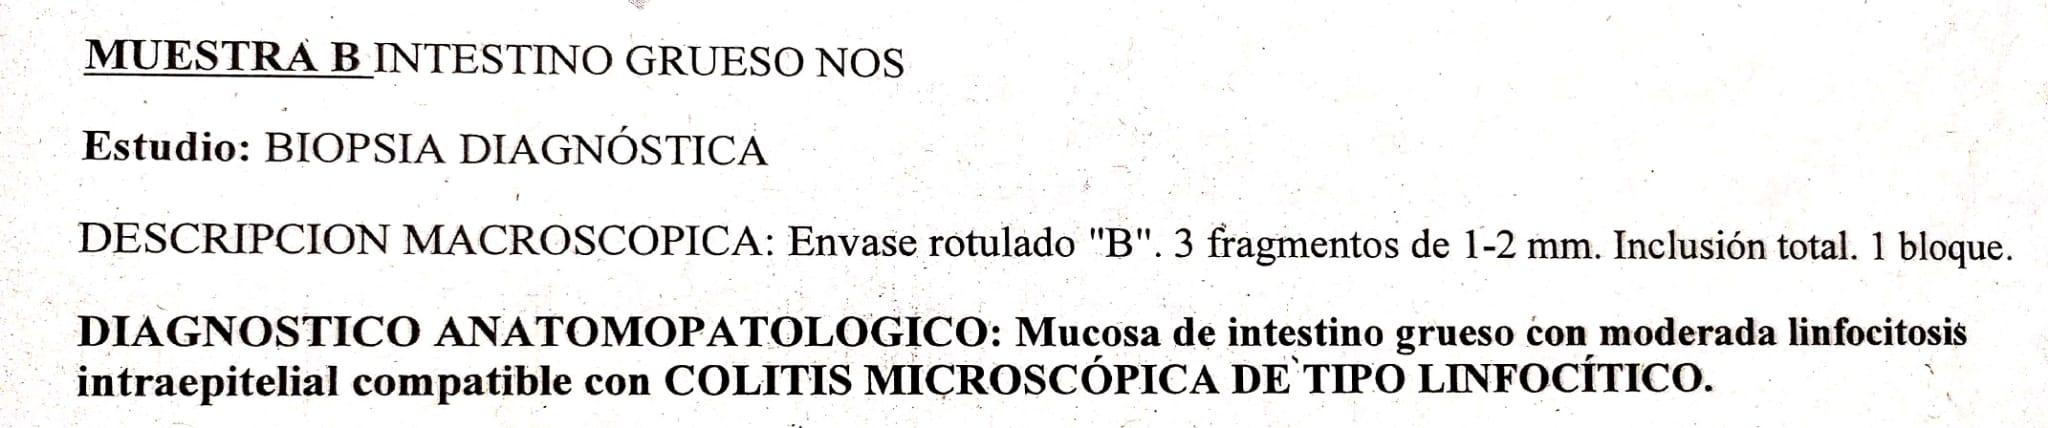 colitis_linfocitica_biopsia